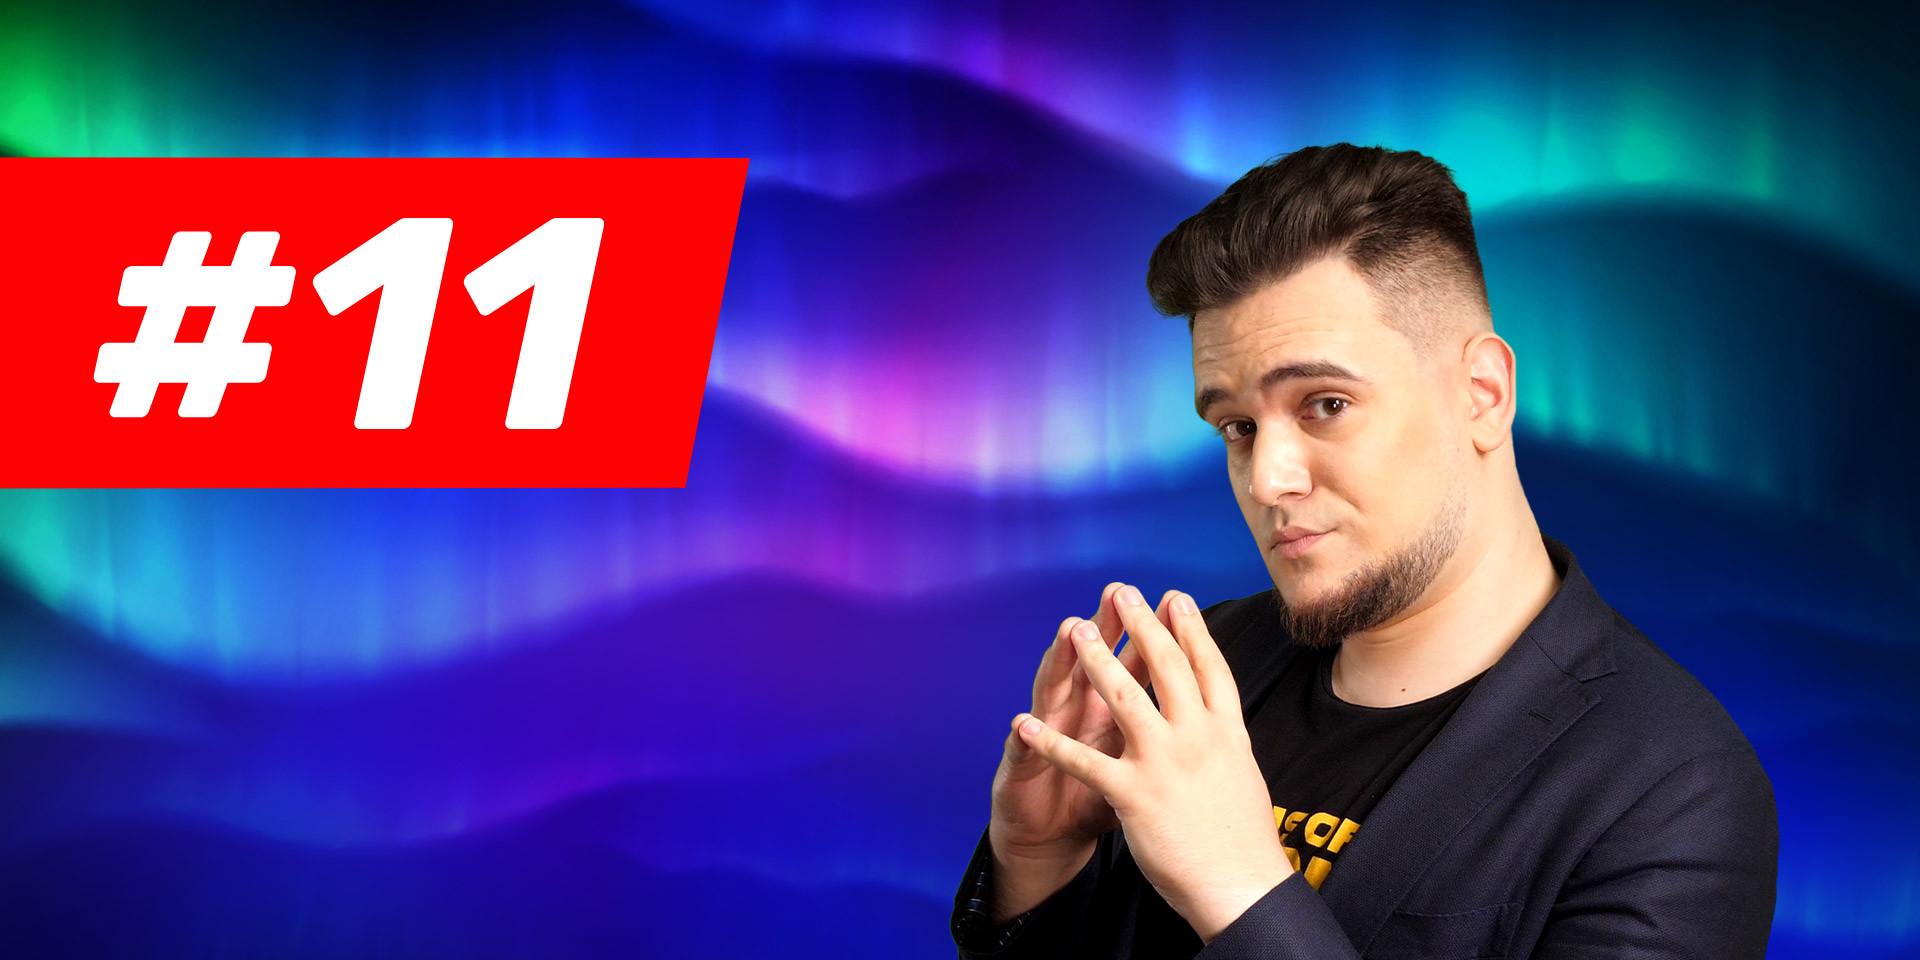 weekly-news-11-pve-season-8-and-esports-r6auBXleZZ